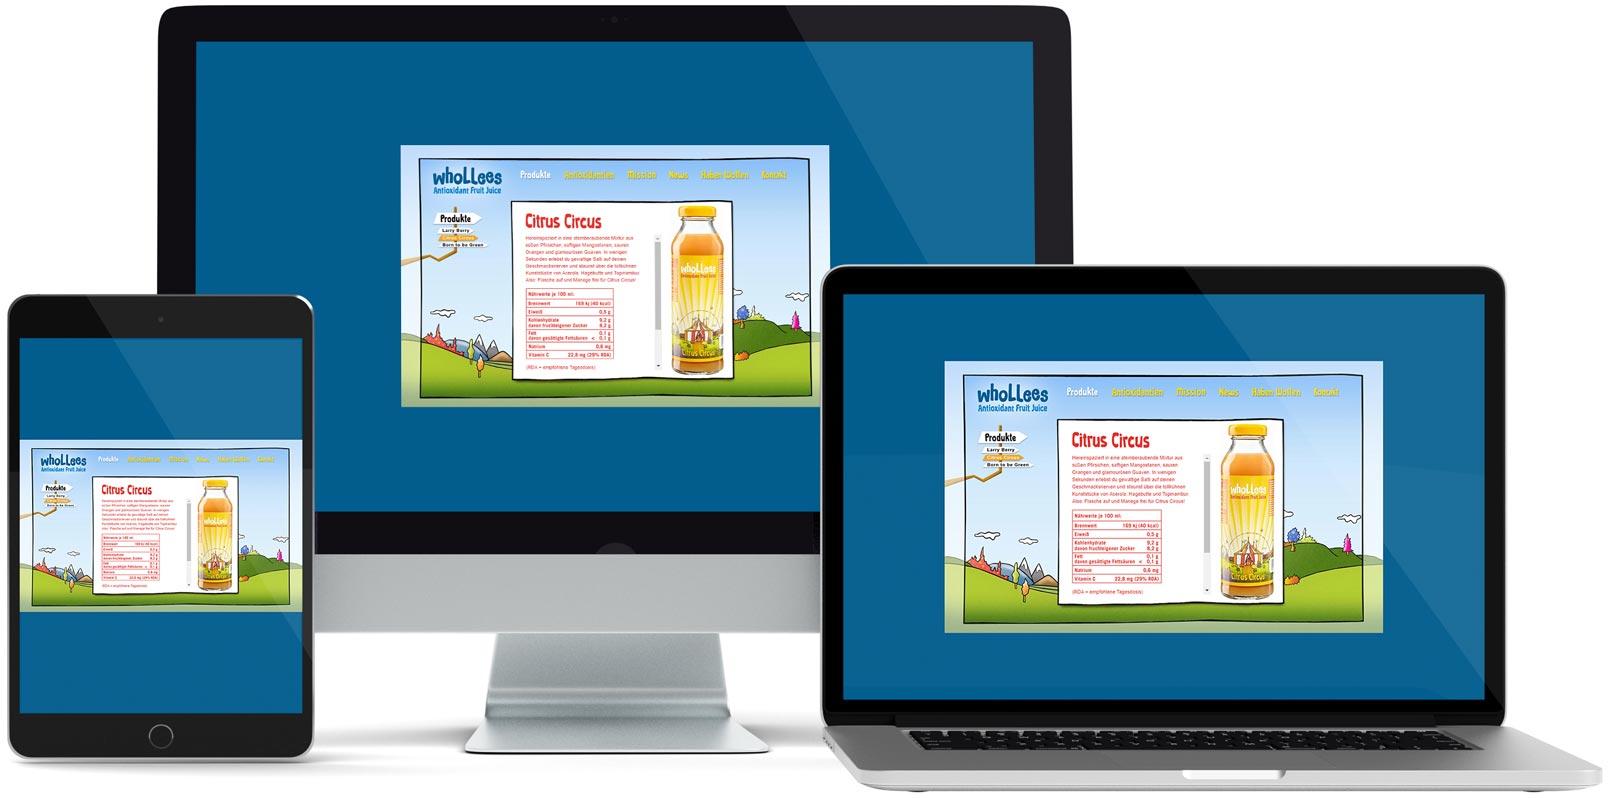 Dreamweaver Webdesign: Whollees